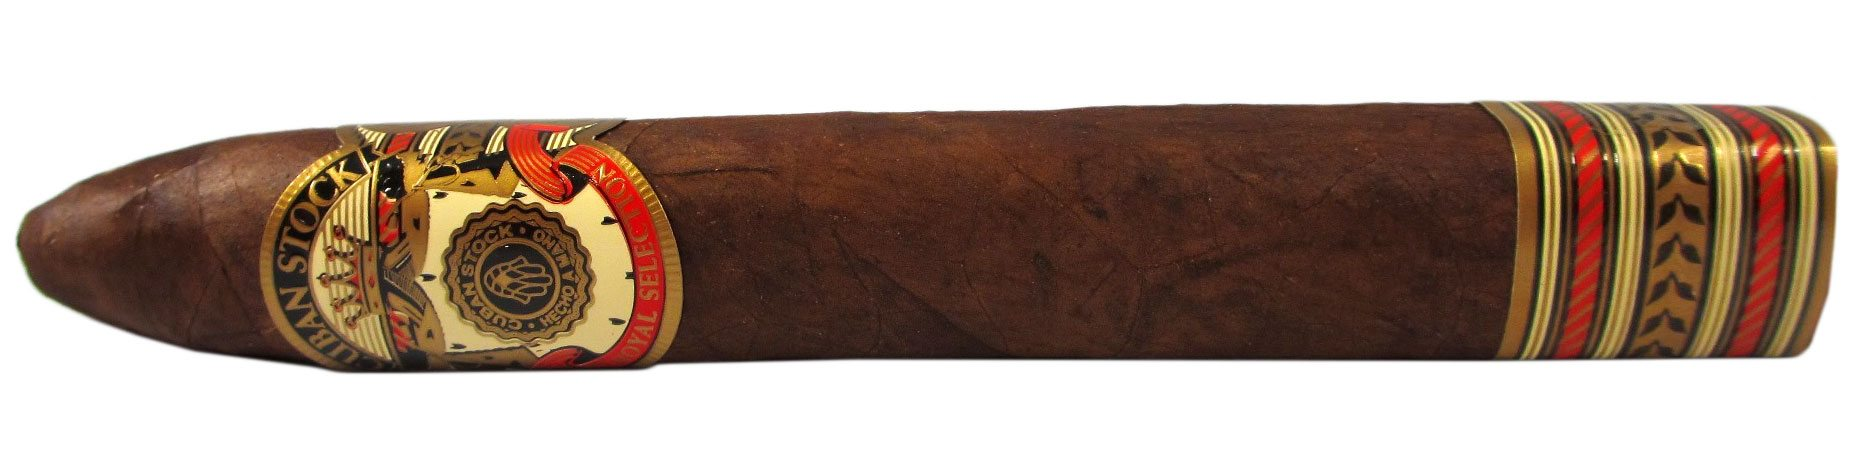 Blind Cigar Review: Cuban Stock | Royal Selection Torpedo